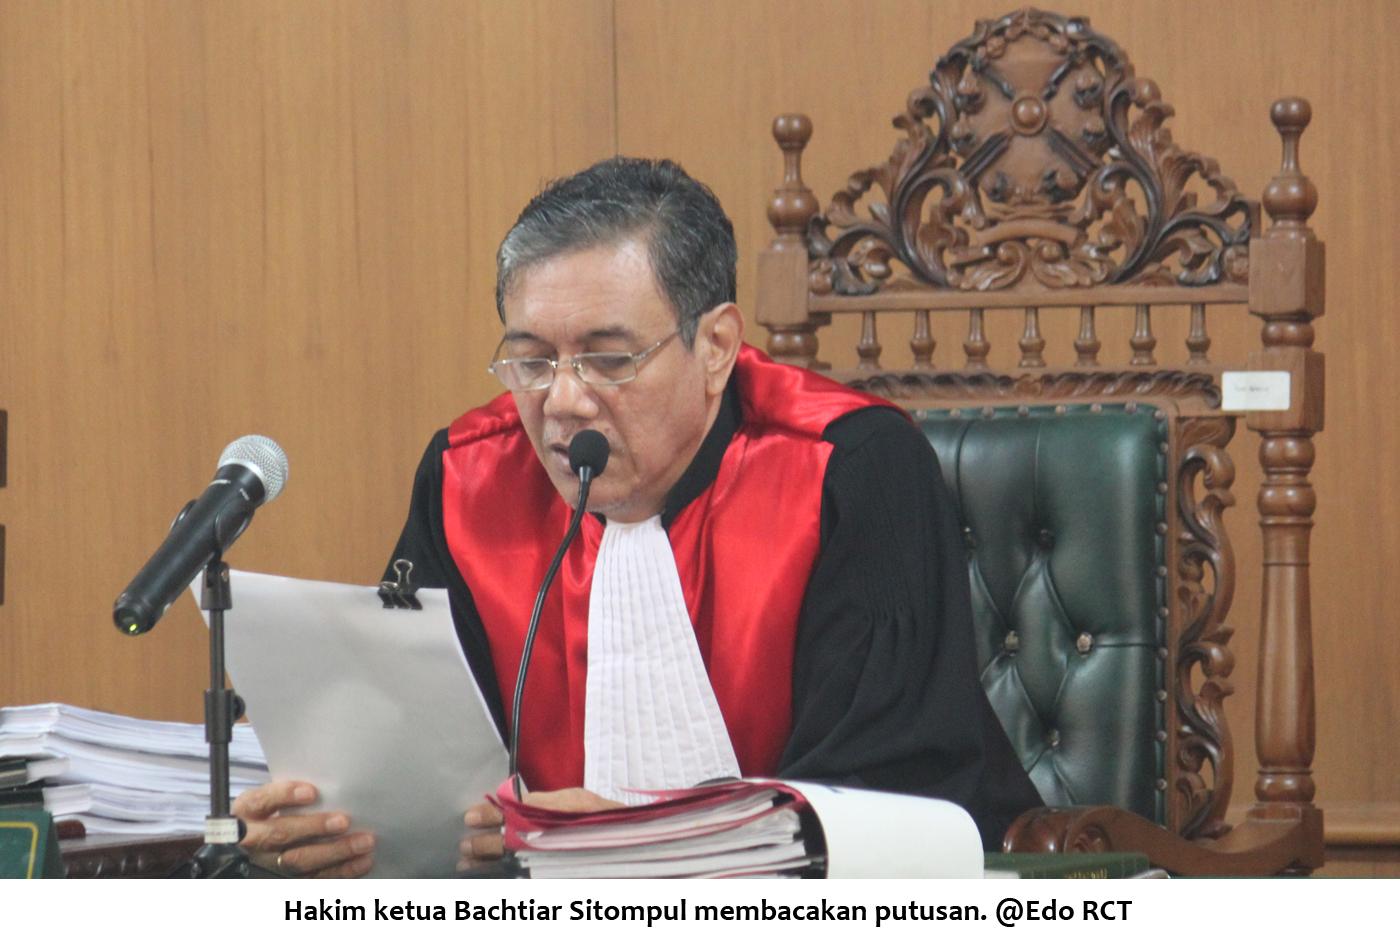 Hakim ketua Bachtiar Sitompul membacakan putusan